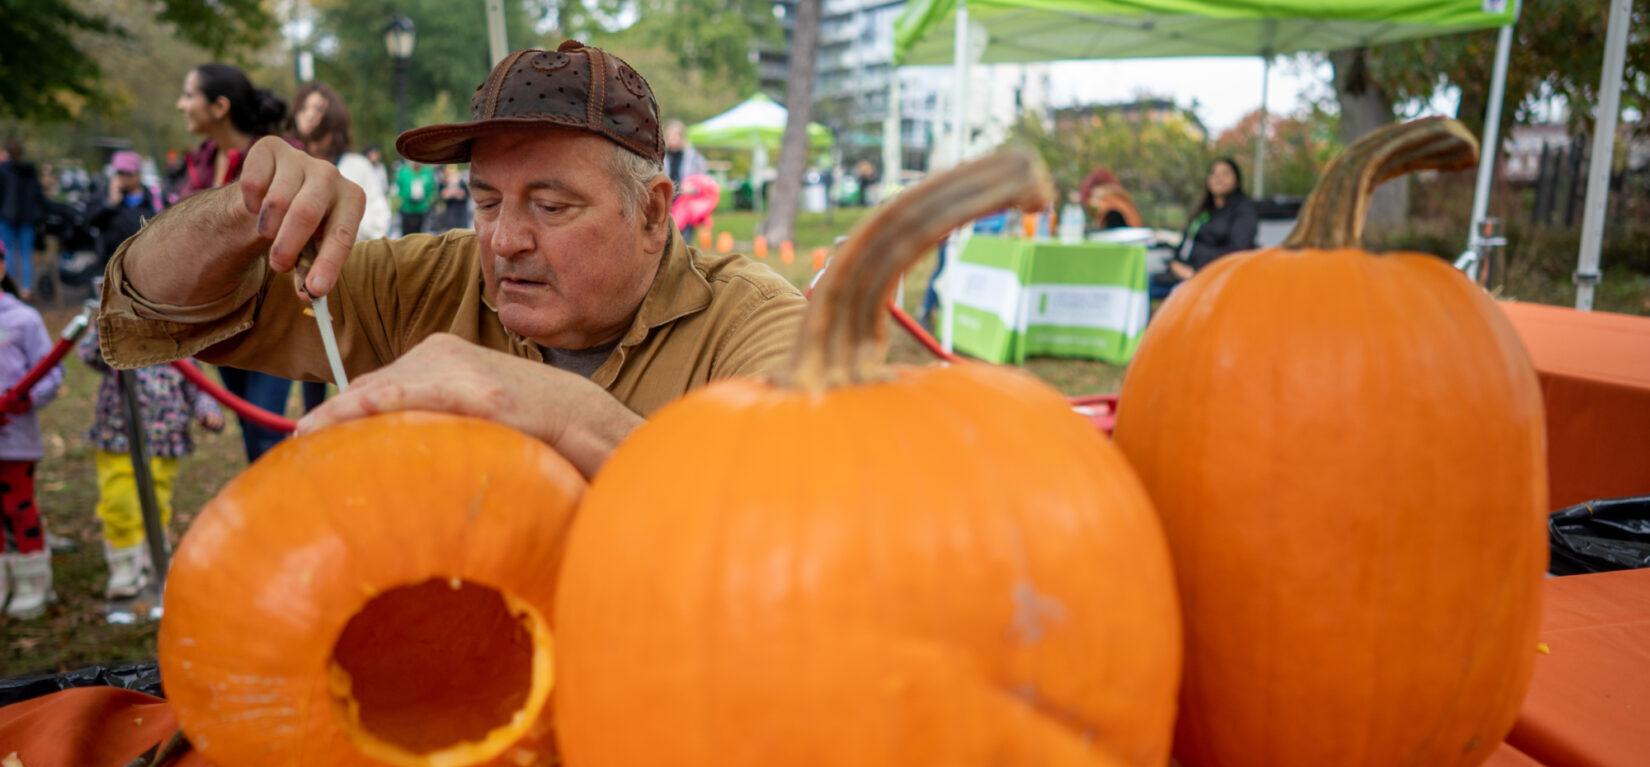 A Park staff member carving his way through a several pumpkins